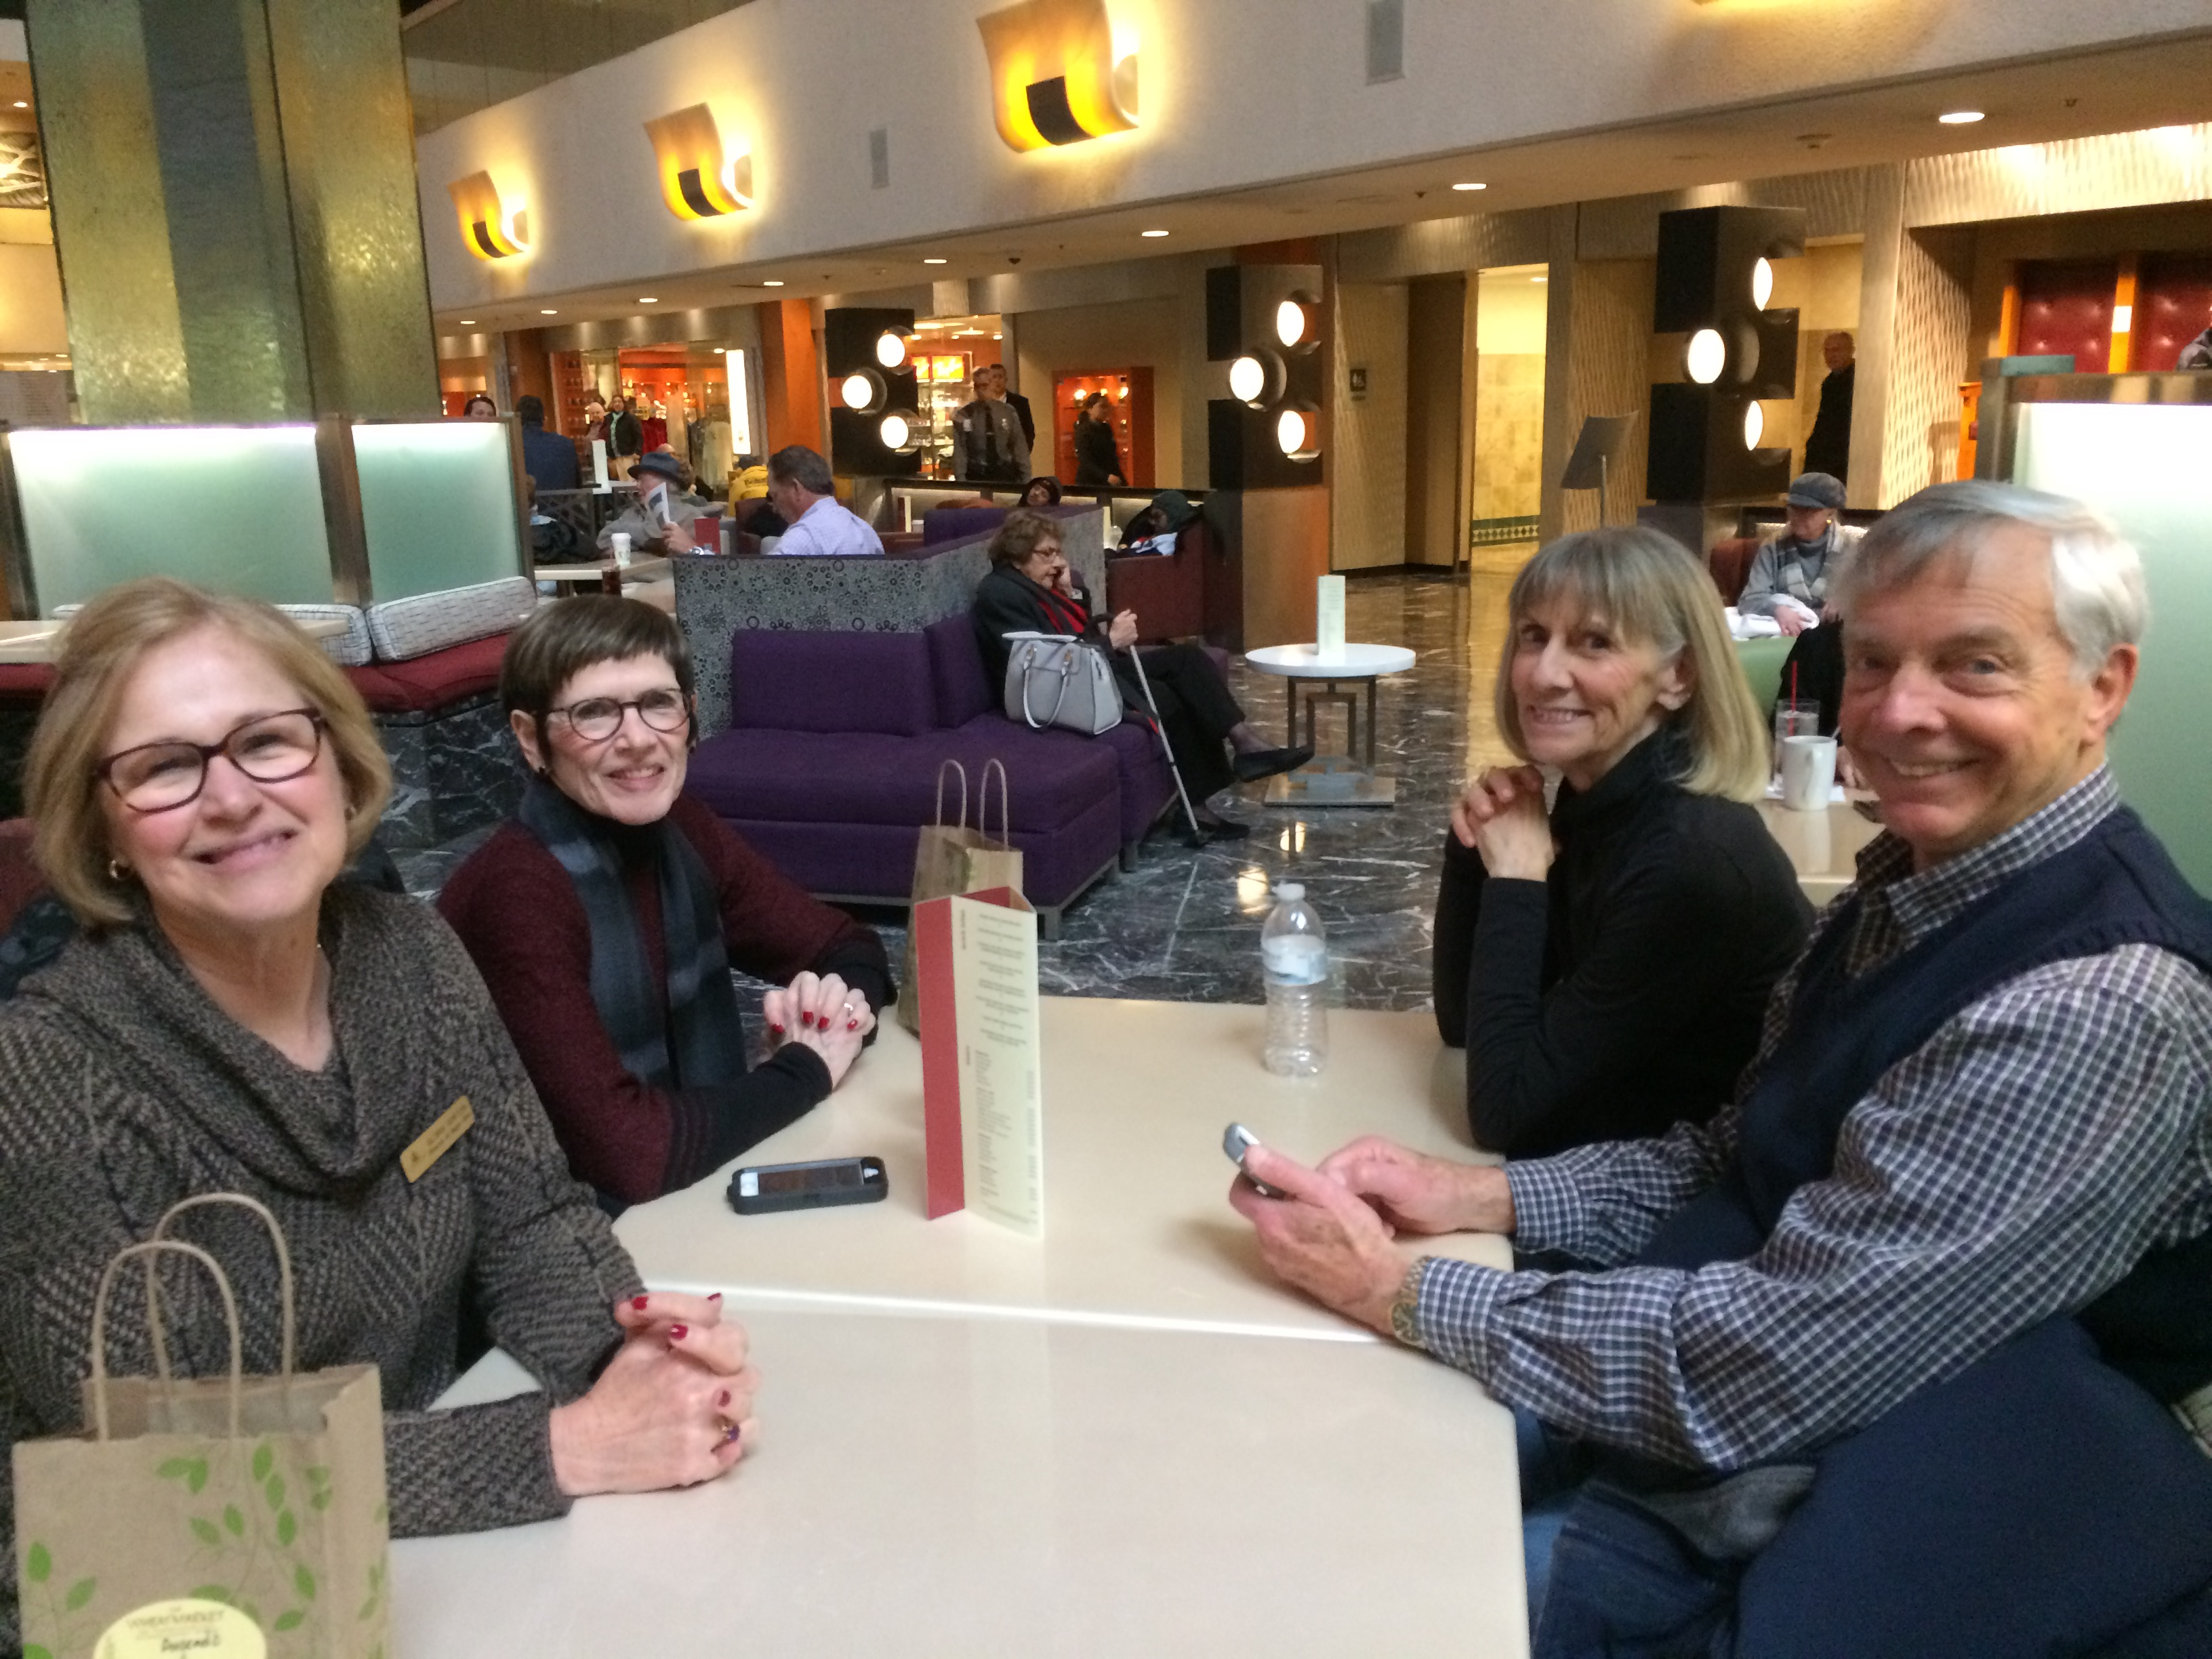 Gloria Gorton, Mary Jane Dunn, Joanne & David Marriott Relaxing